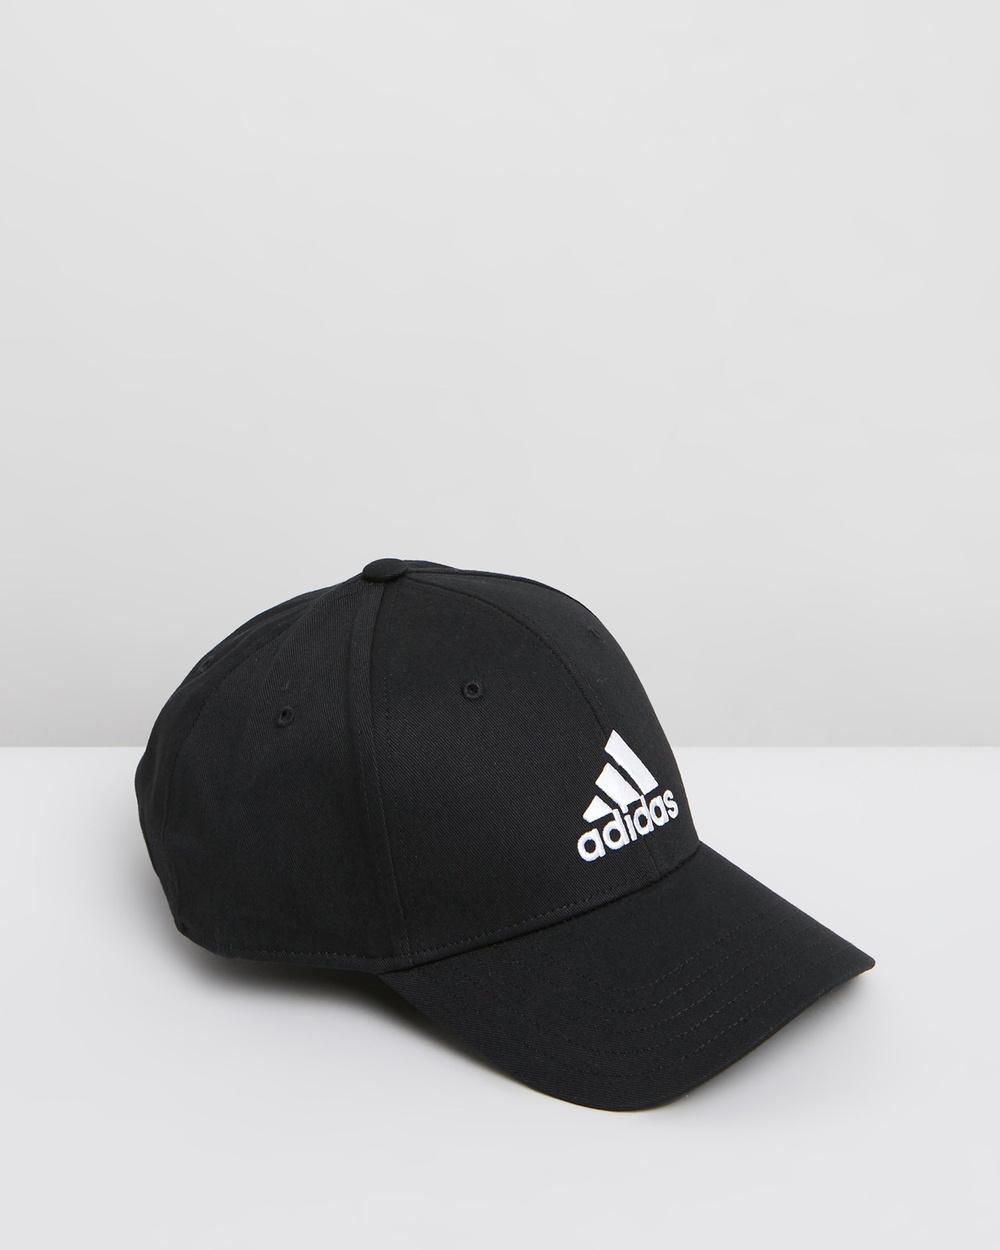 adidas Performance Baseball Training Cap Unisex Headwear Black, Black & White